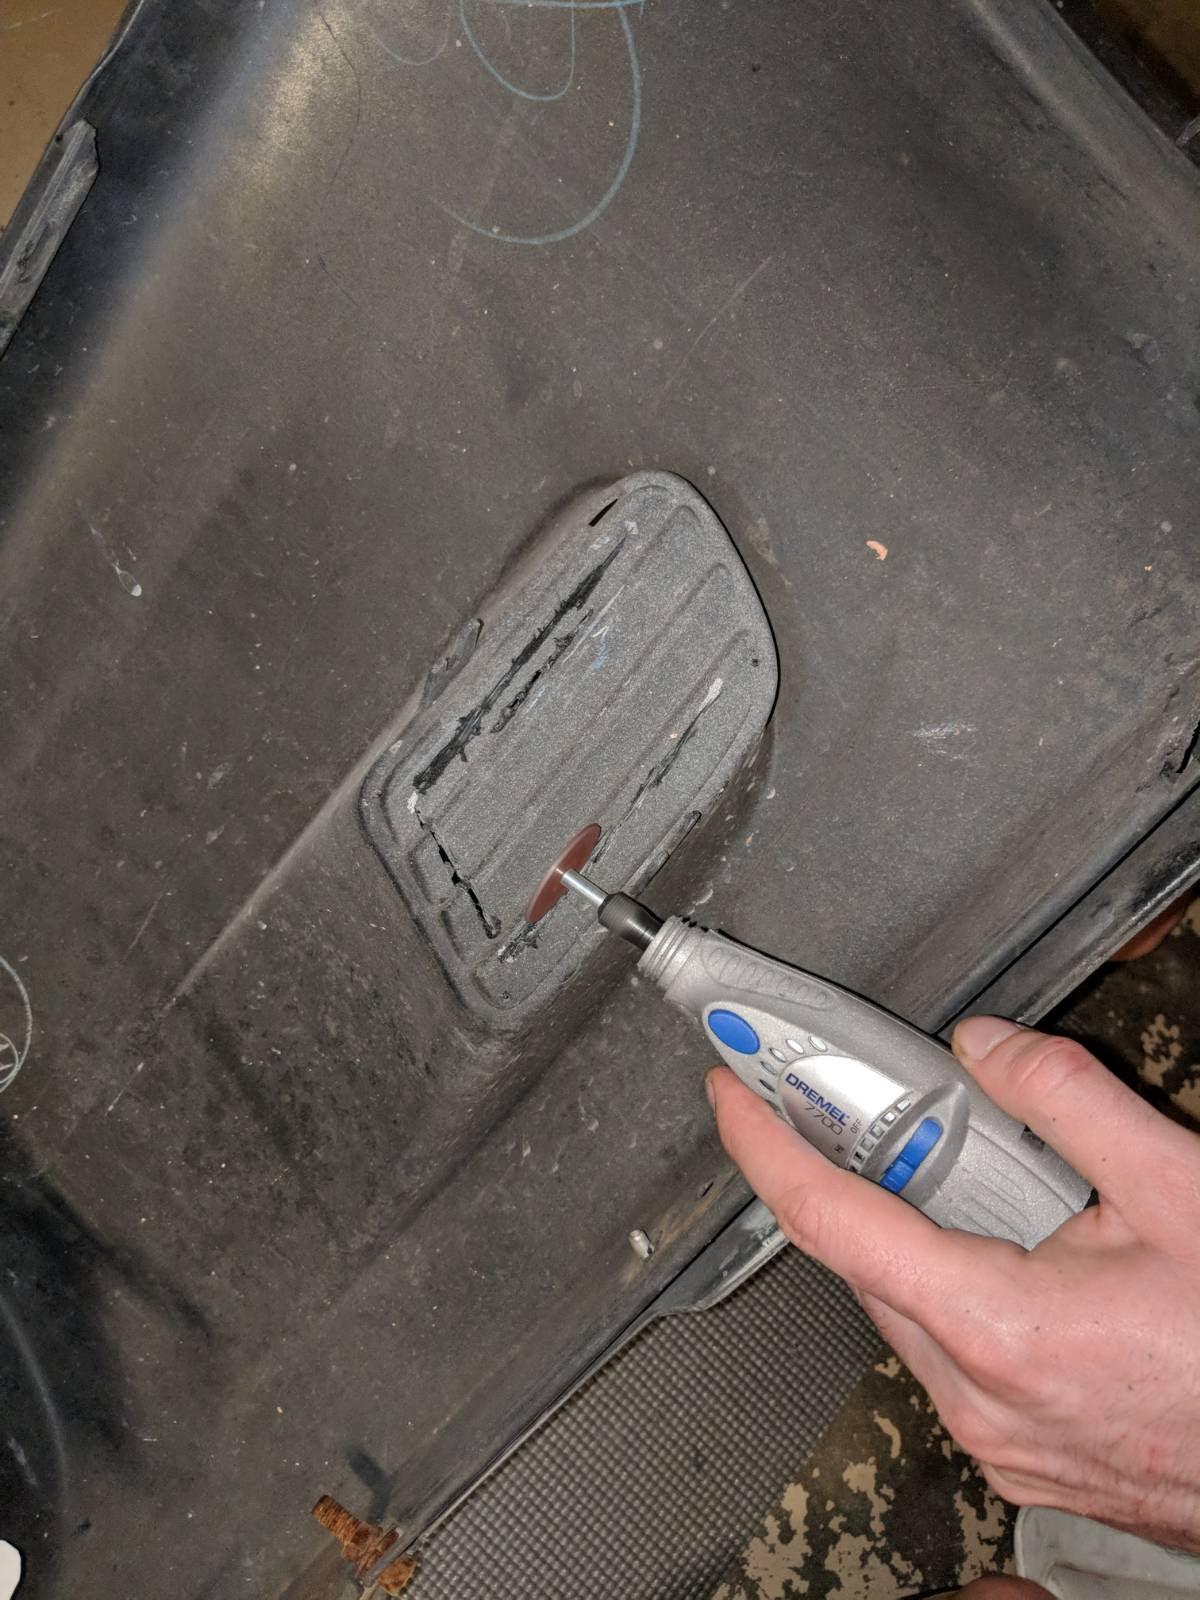 Cutting initial hole using a dremel